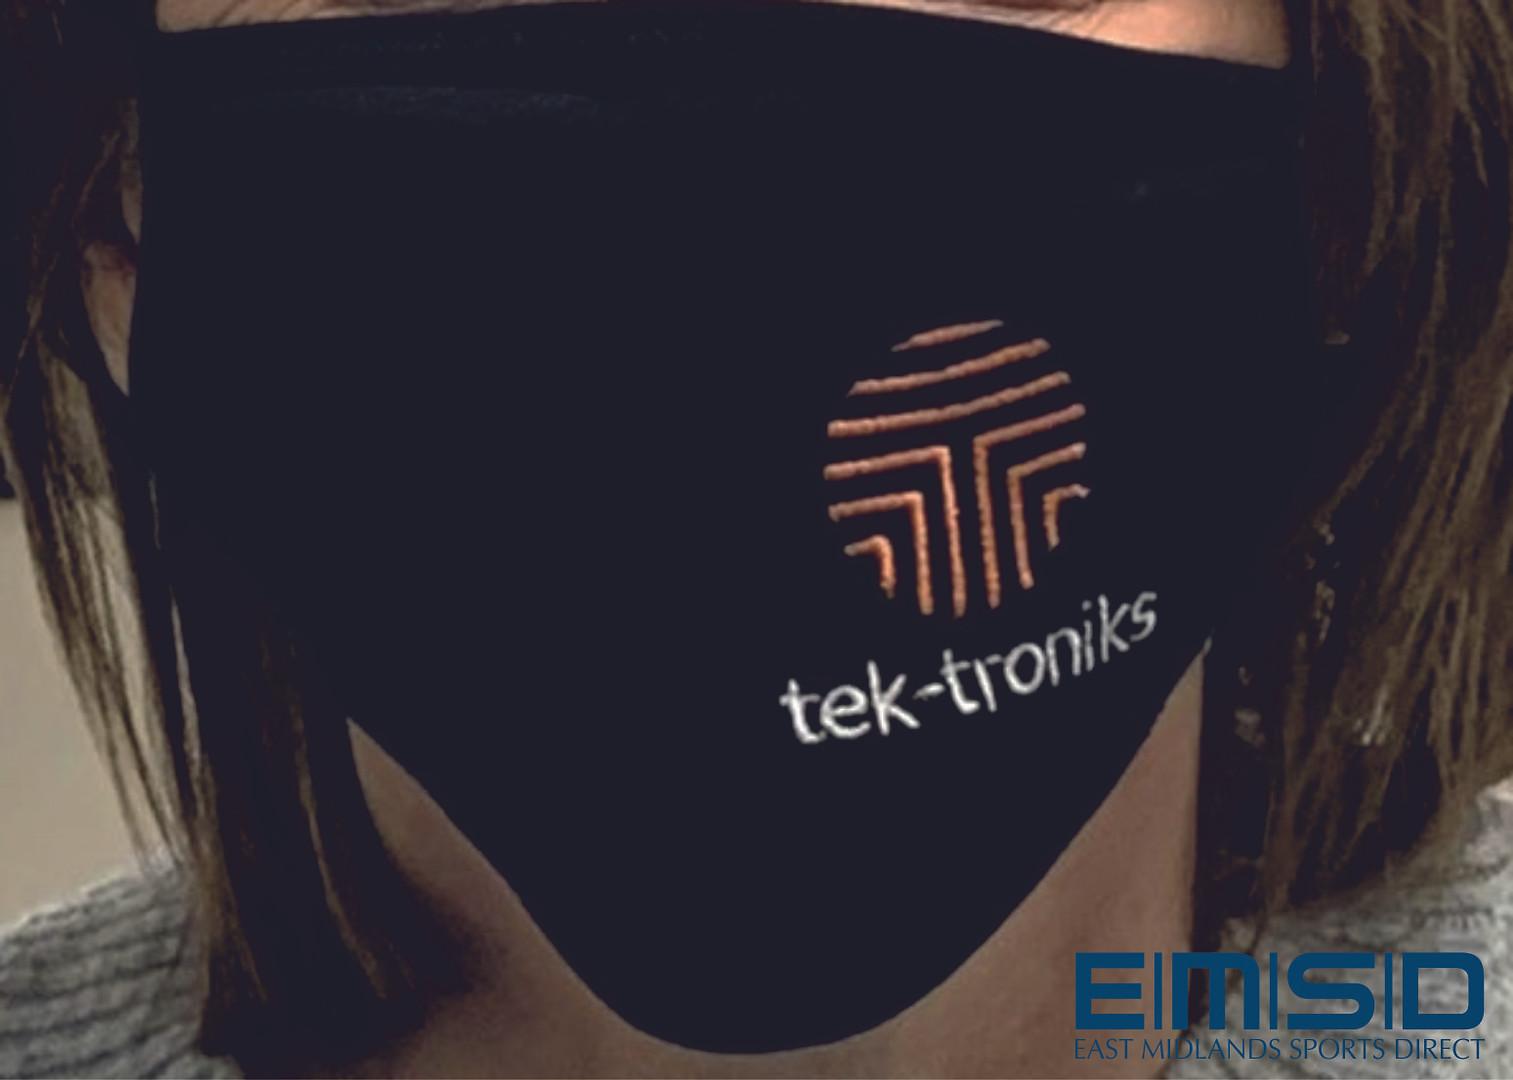 Tektroniks - front view